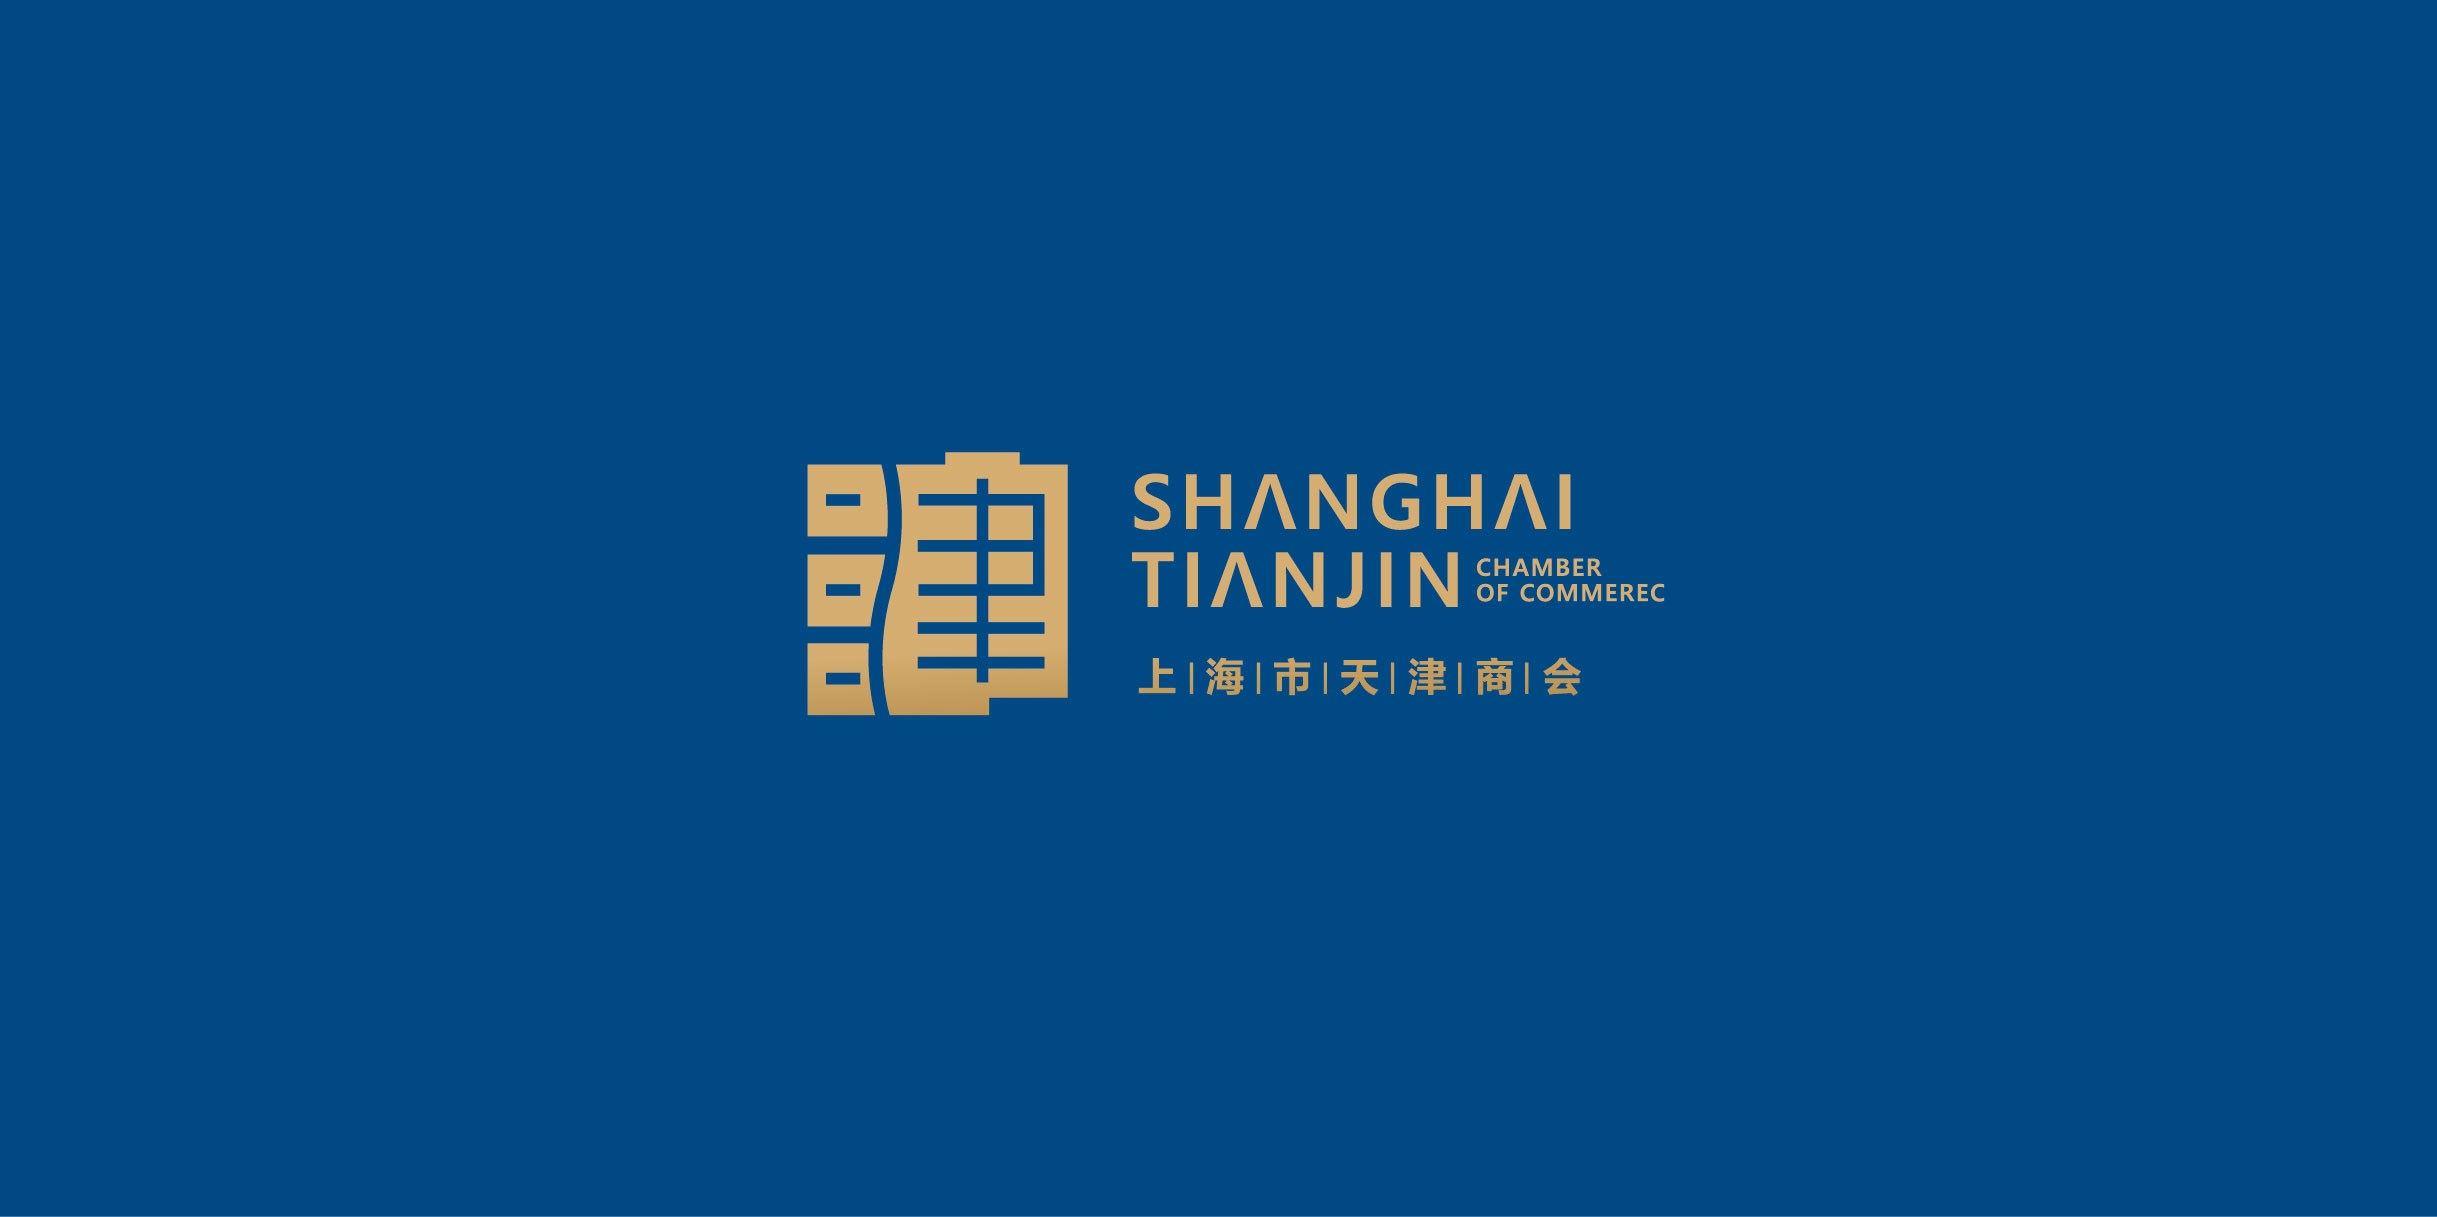 SSC设计-上海是半苦涩半微笑市天津商会ぷ